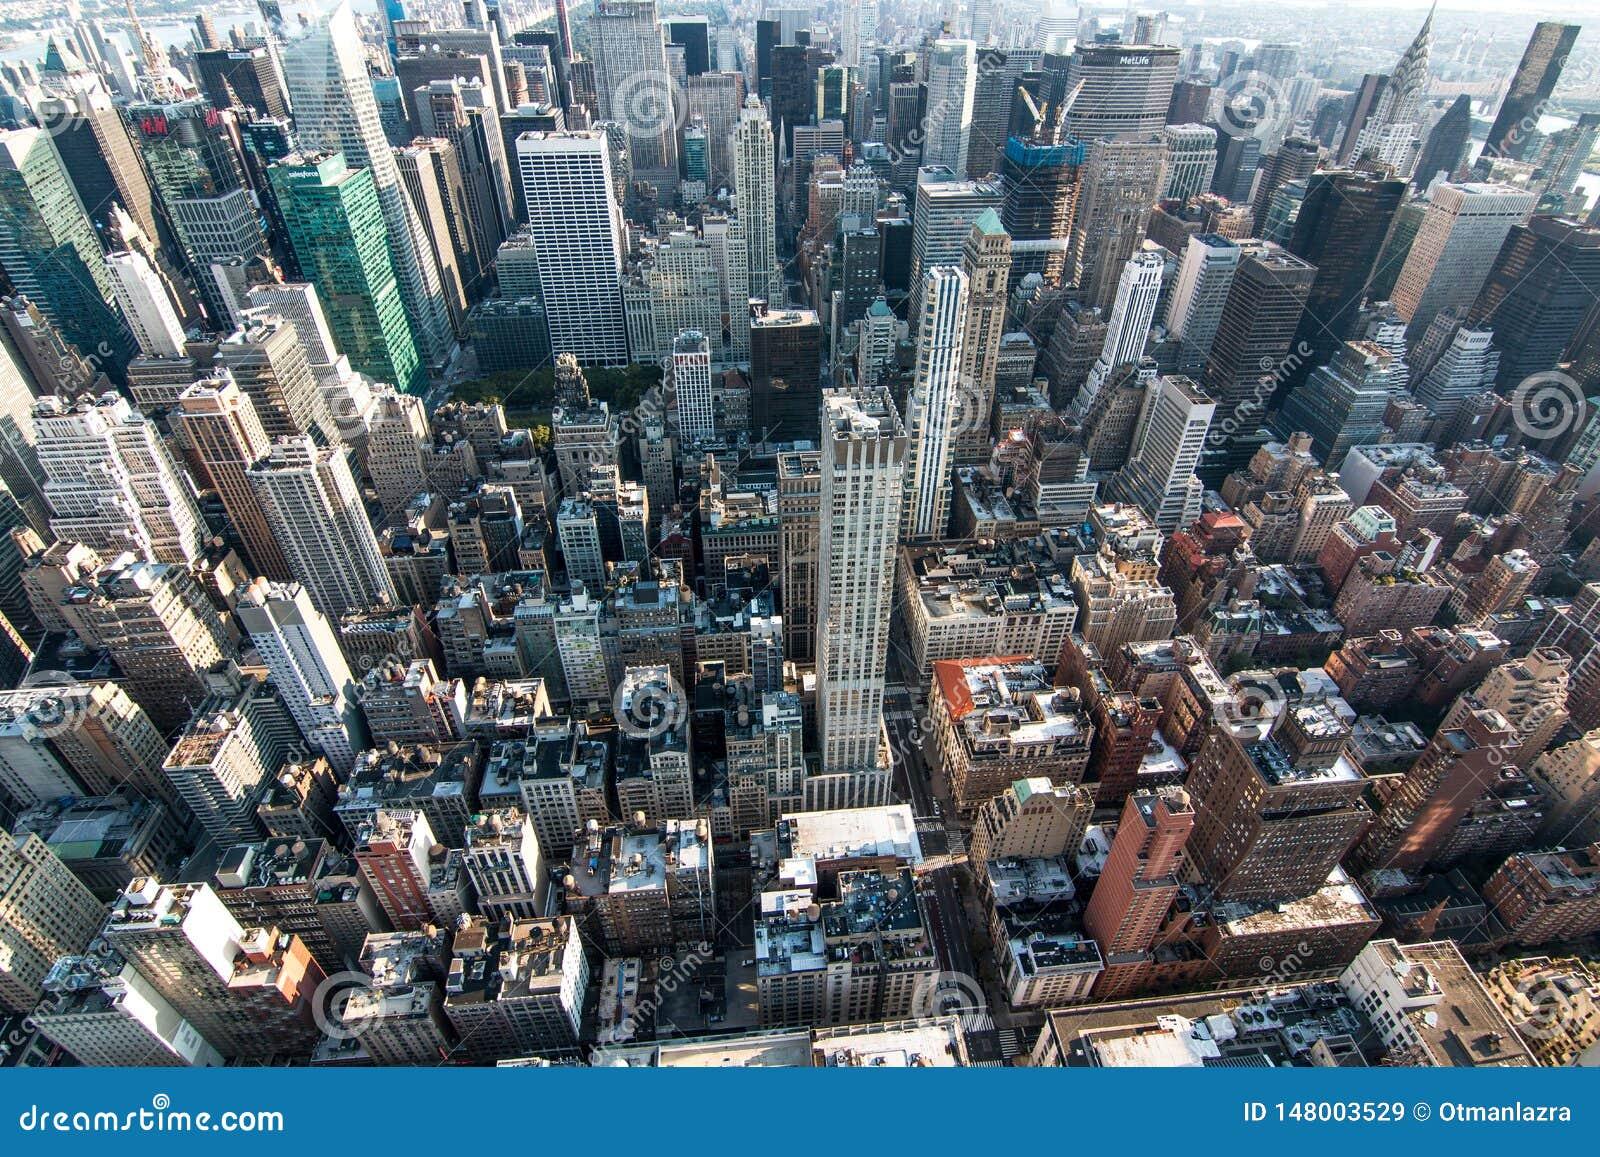 Aerial view of Manhattan midtown